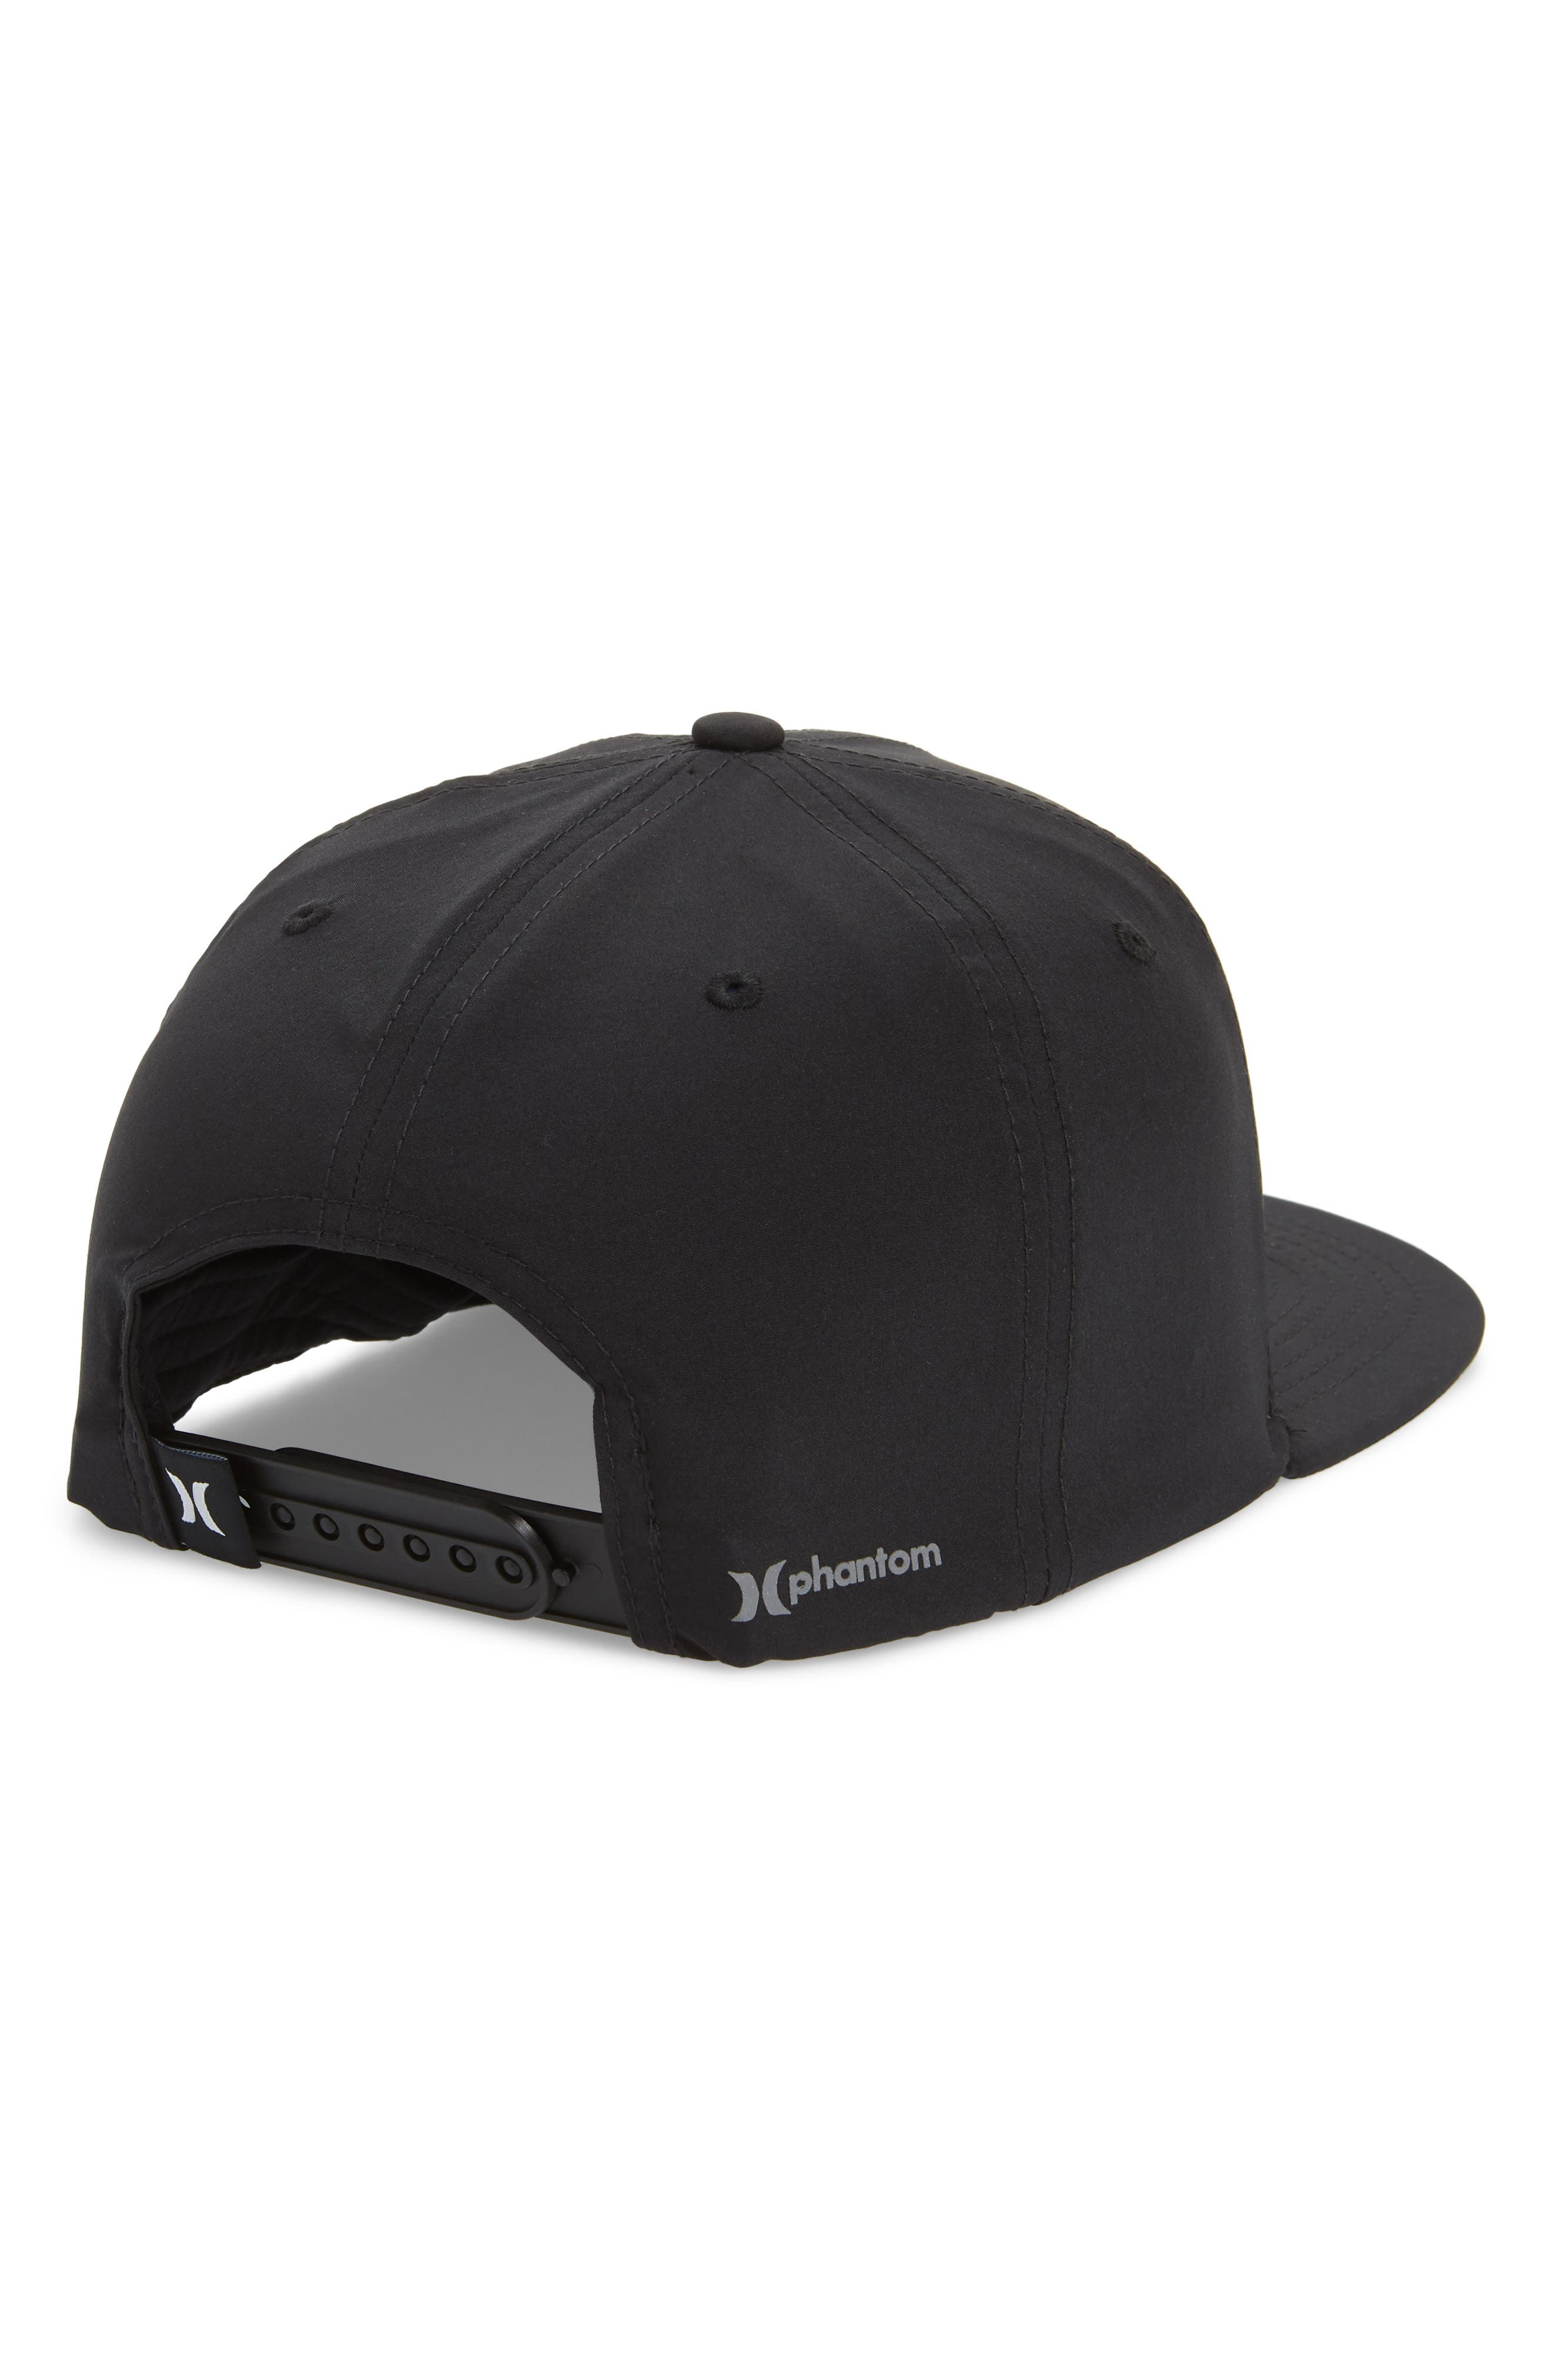 Phantom Corp Hat,                             Alternate thumbnail 2, color,                             010